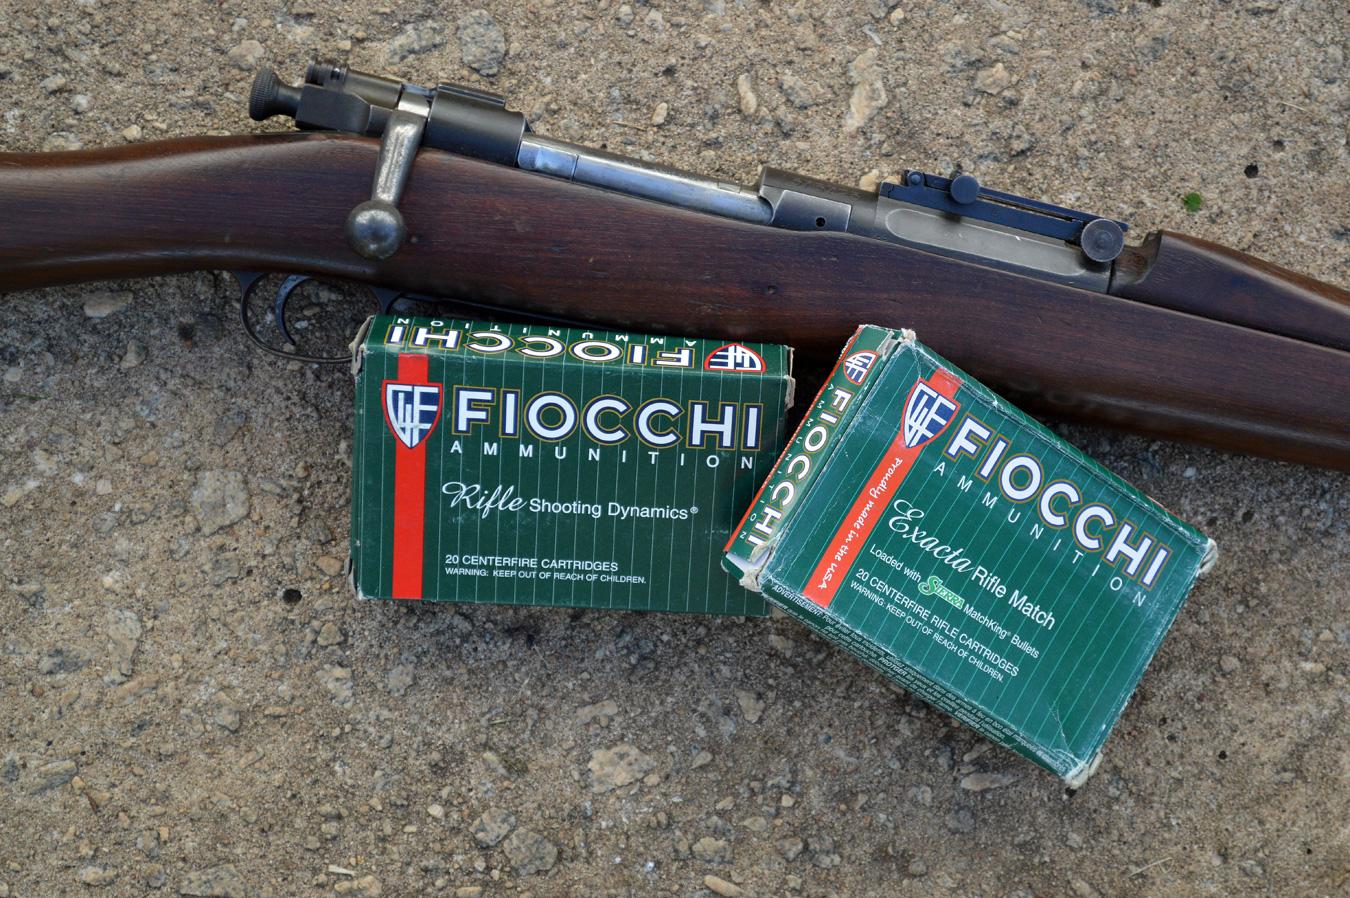 Review: Fiocchi  30-06 Springfield Ammunition - The K-Var Armory